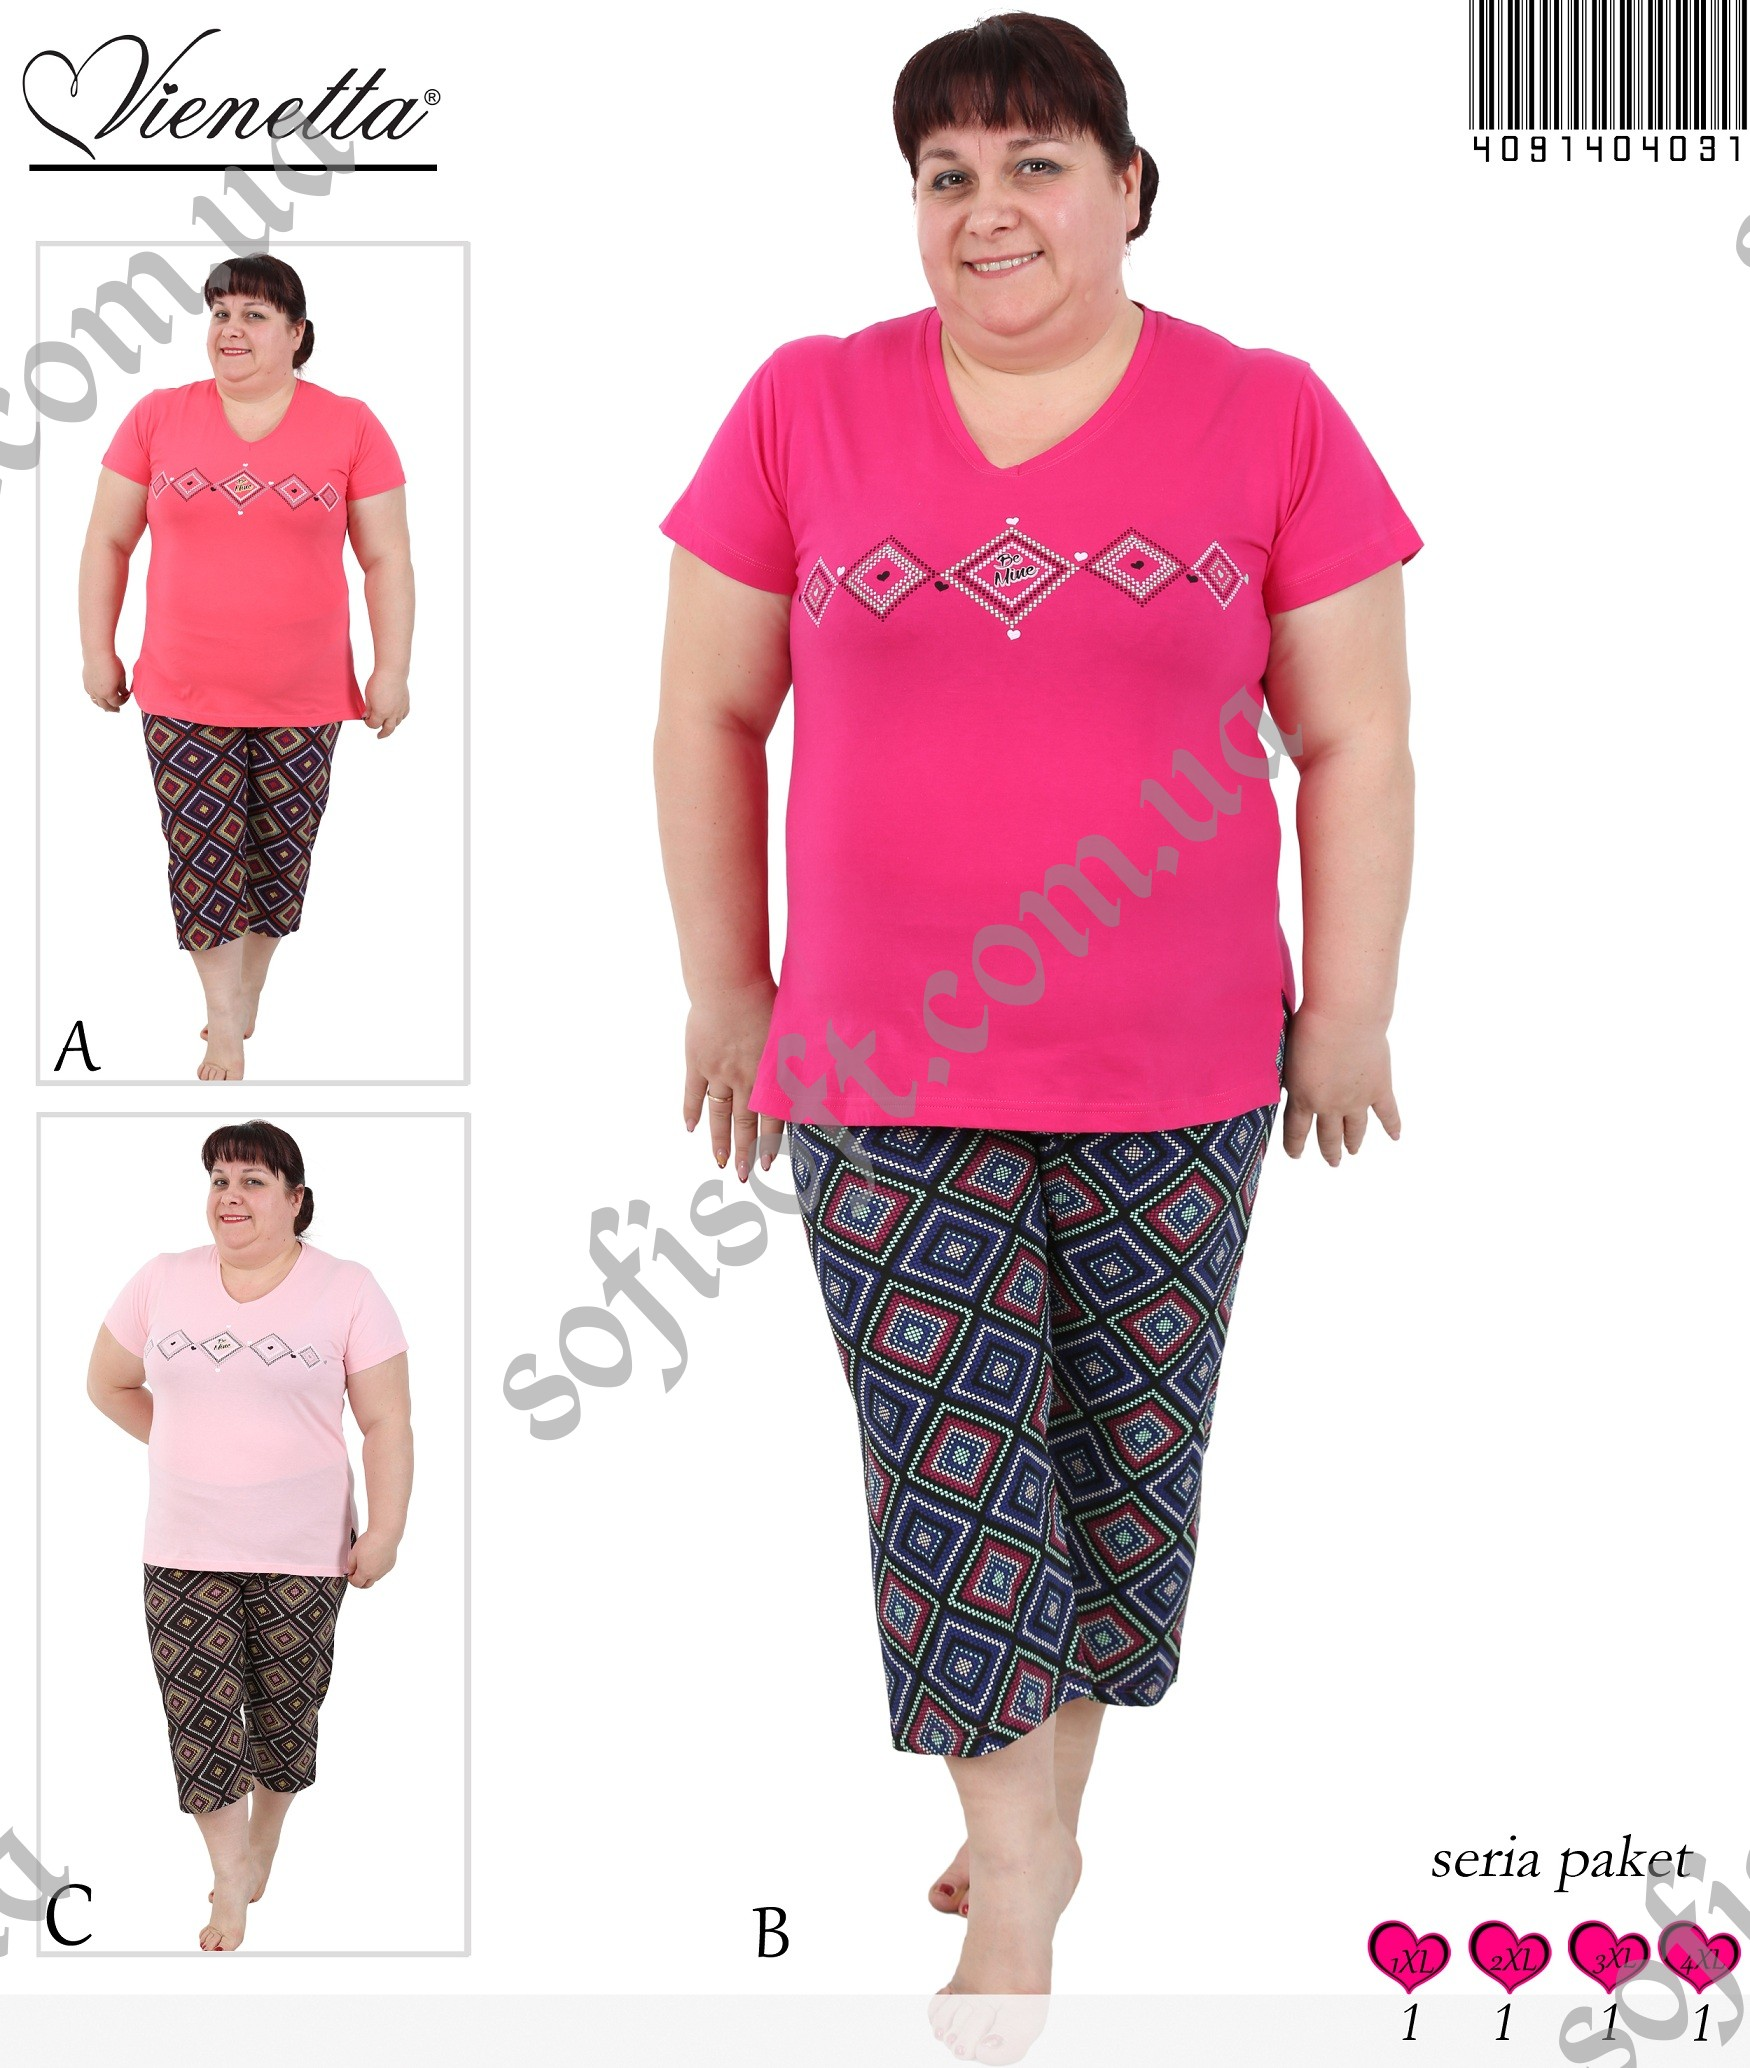 Пижама женская Капри 4091404031